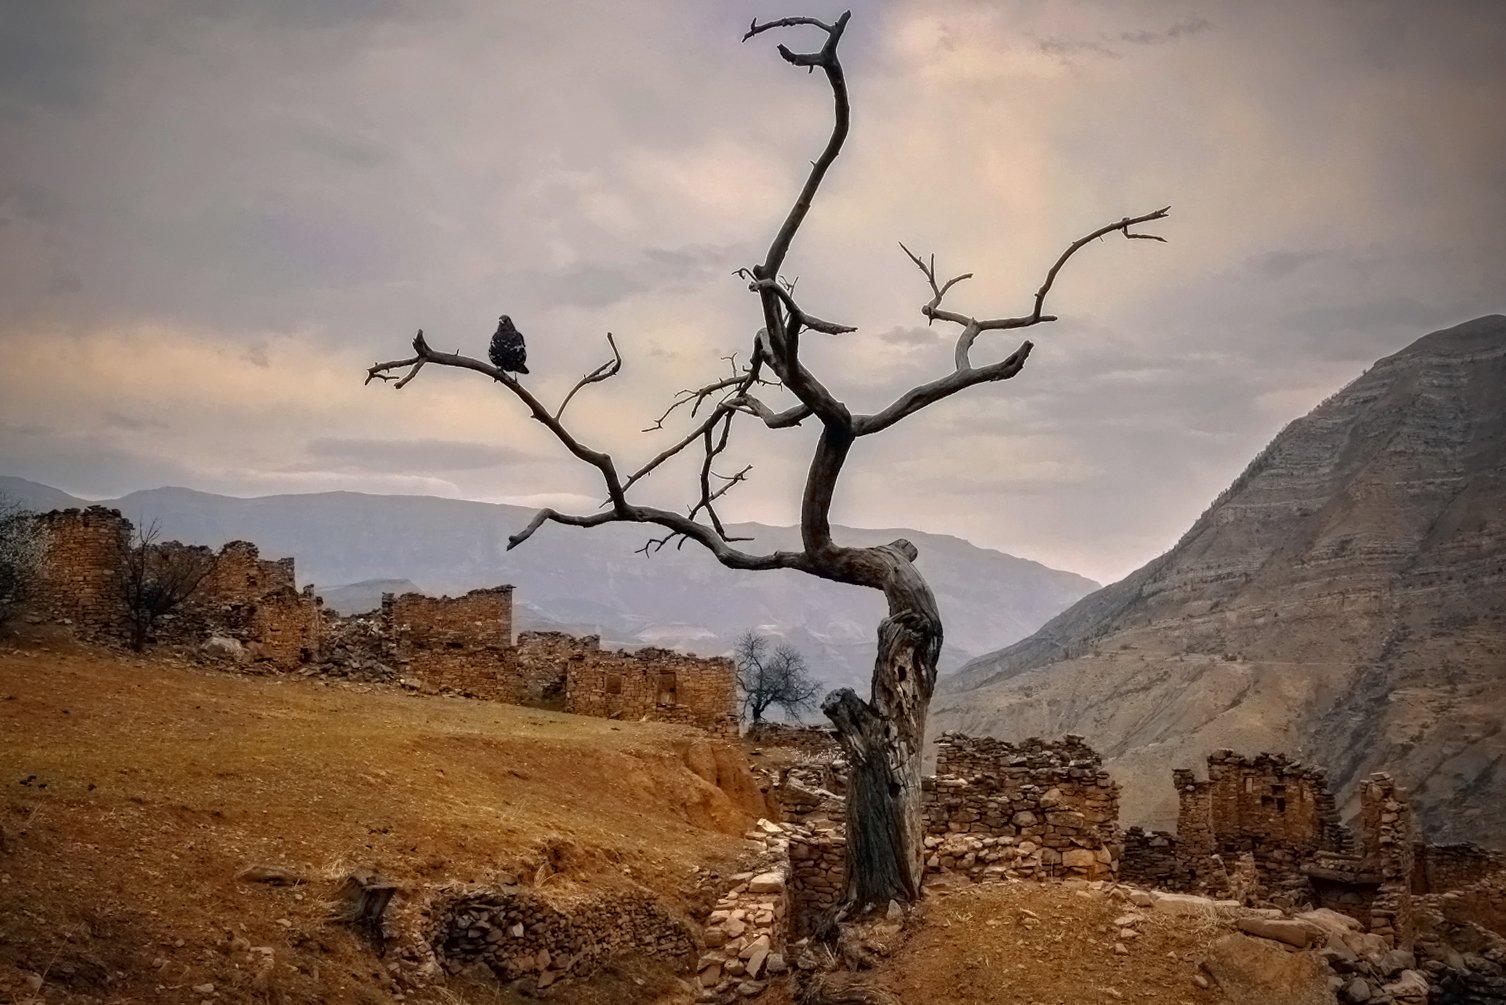 горы,аул,старый аул,хиндах,вершины,пейзаж,небо,деревья,дагестан,природа, Magov Marat